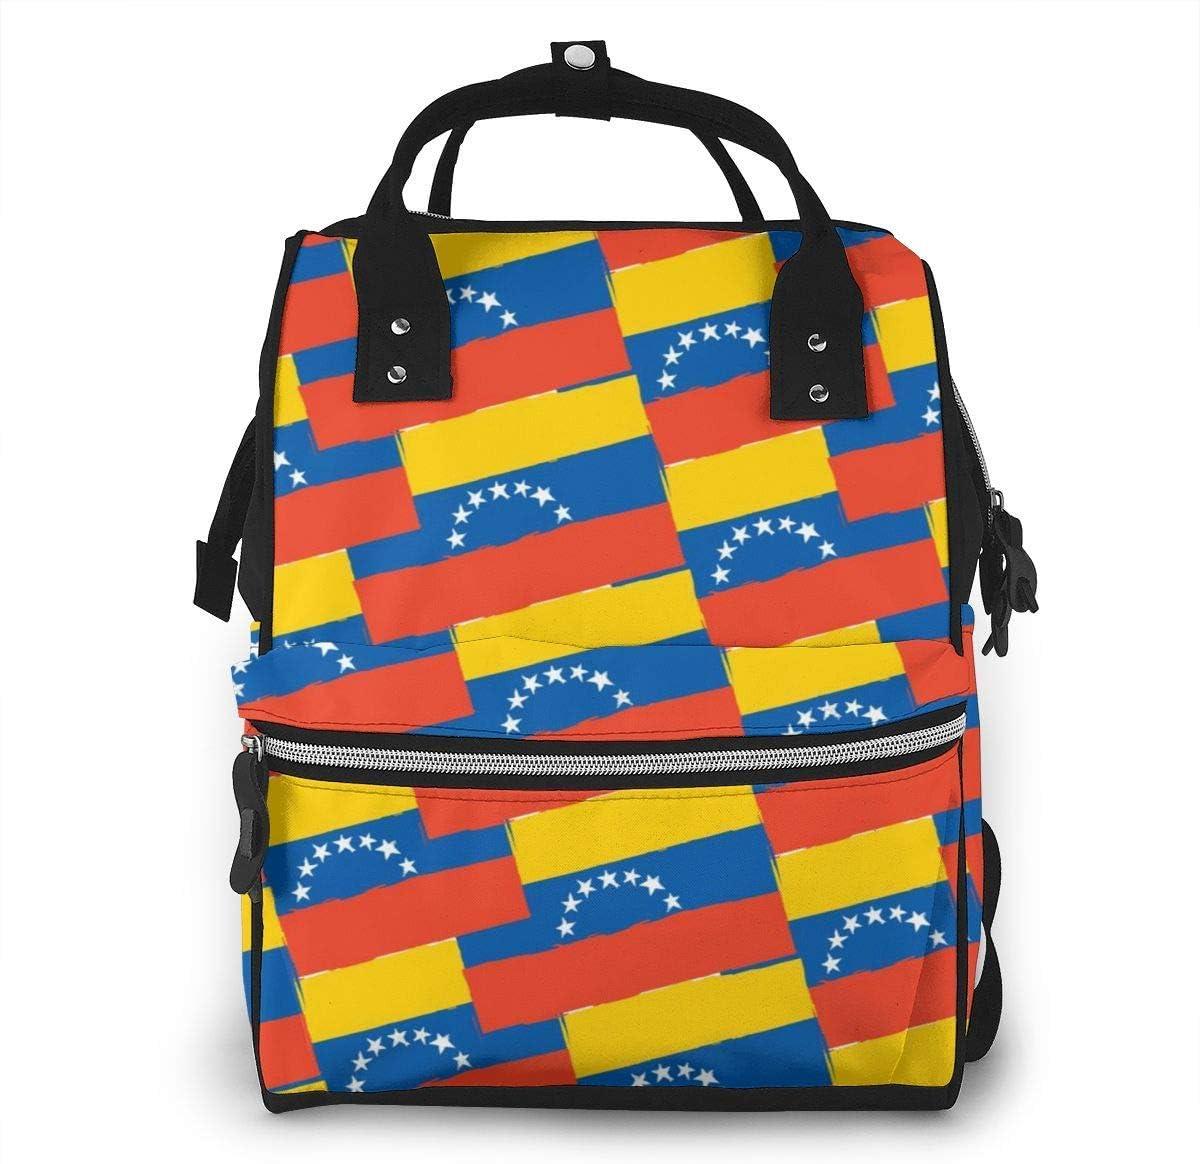 KQJH Venezuela Bandera o pancarta Bolsas de pañales Momia de viaje Bolsas de pañales Mochila de moda Mochila de viaje multifunción